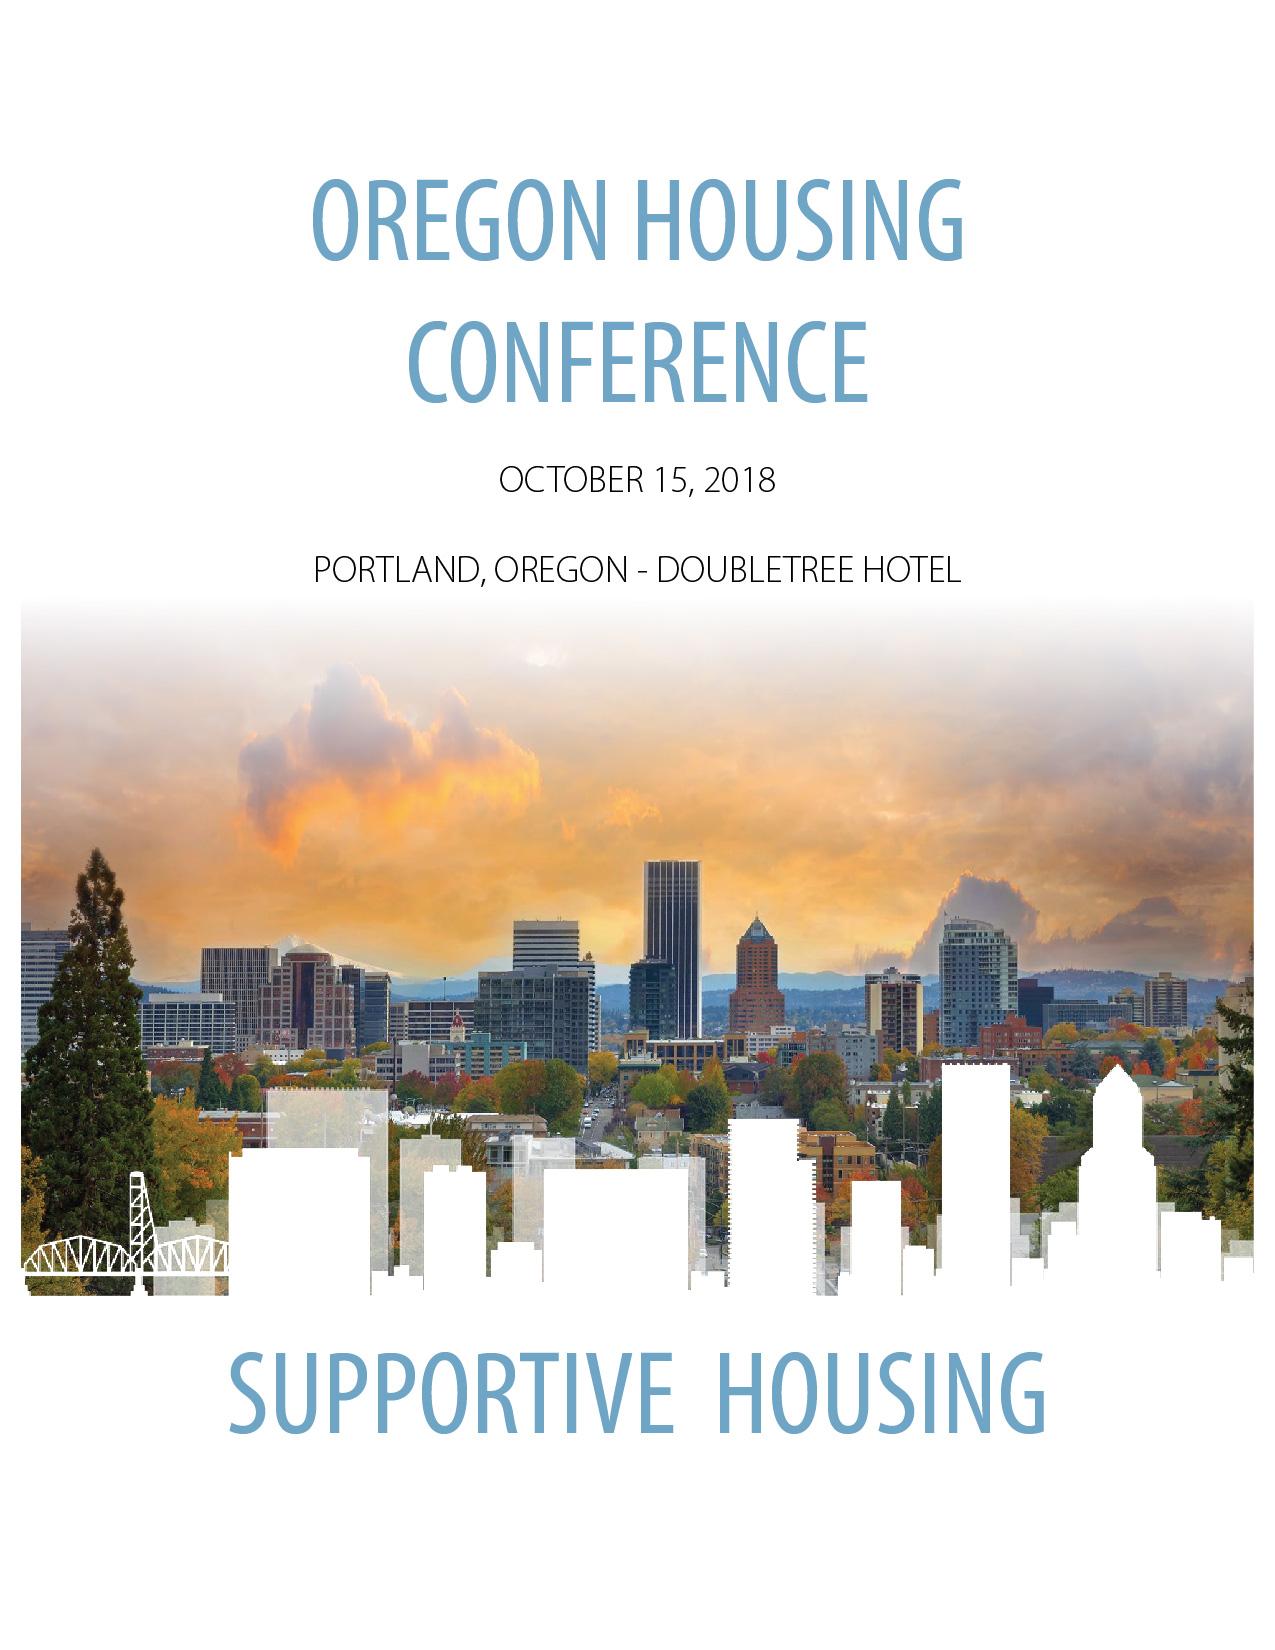 OHC-conference2018-program-01